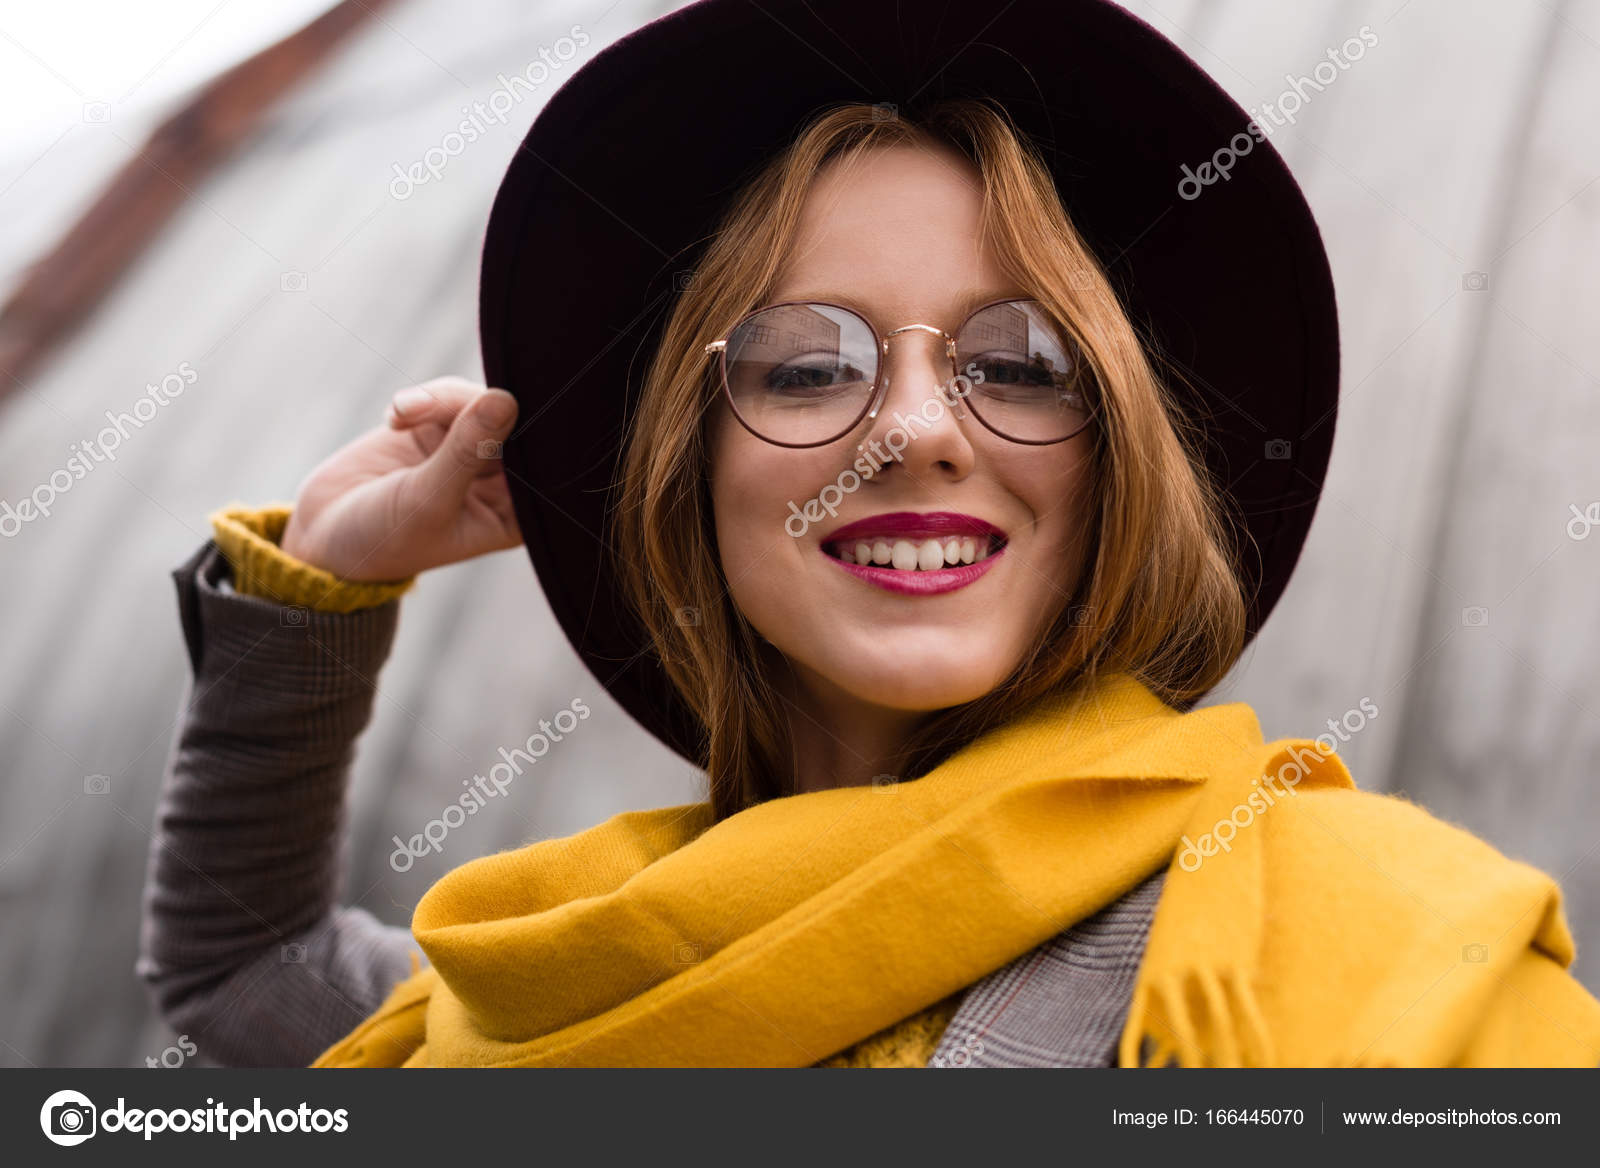 a4edbed6972 Beautiful stylish smiling redhead girl in eyeglasses